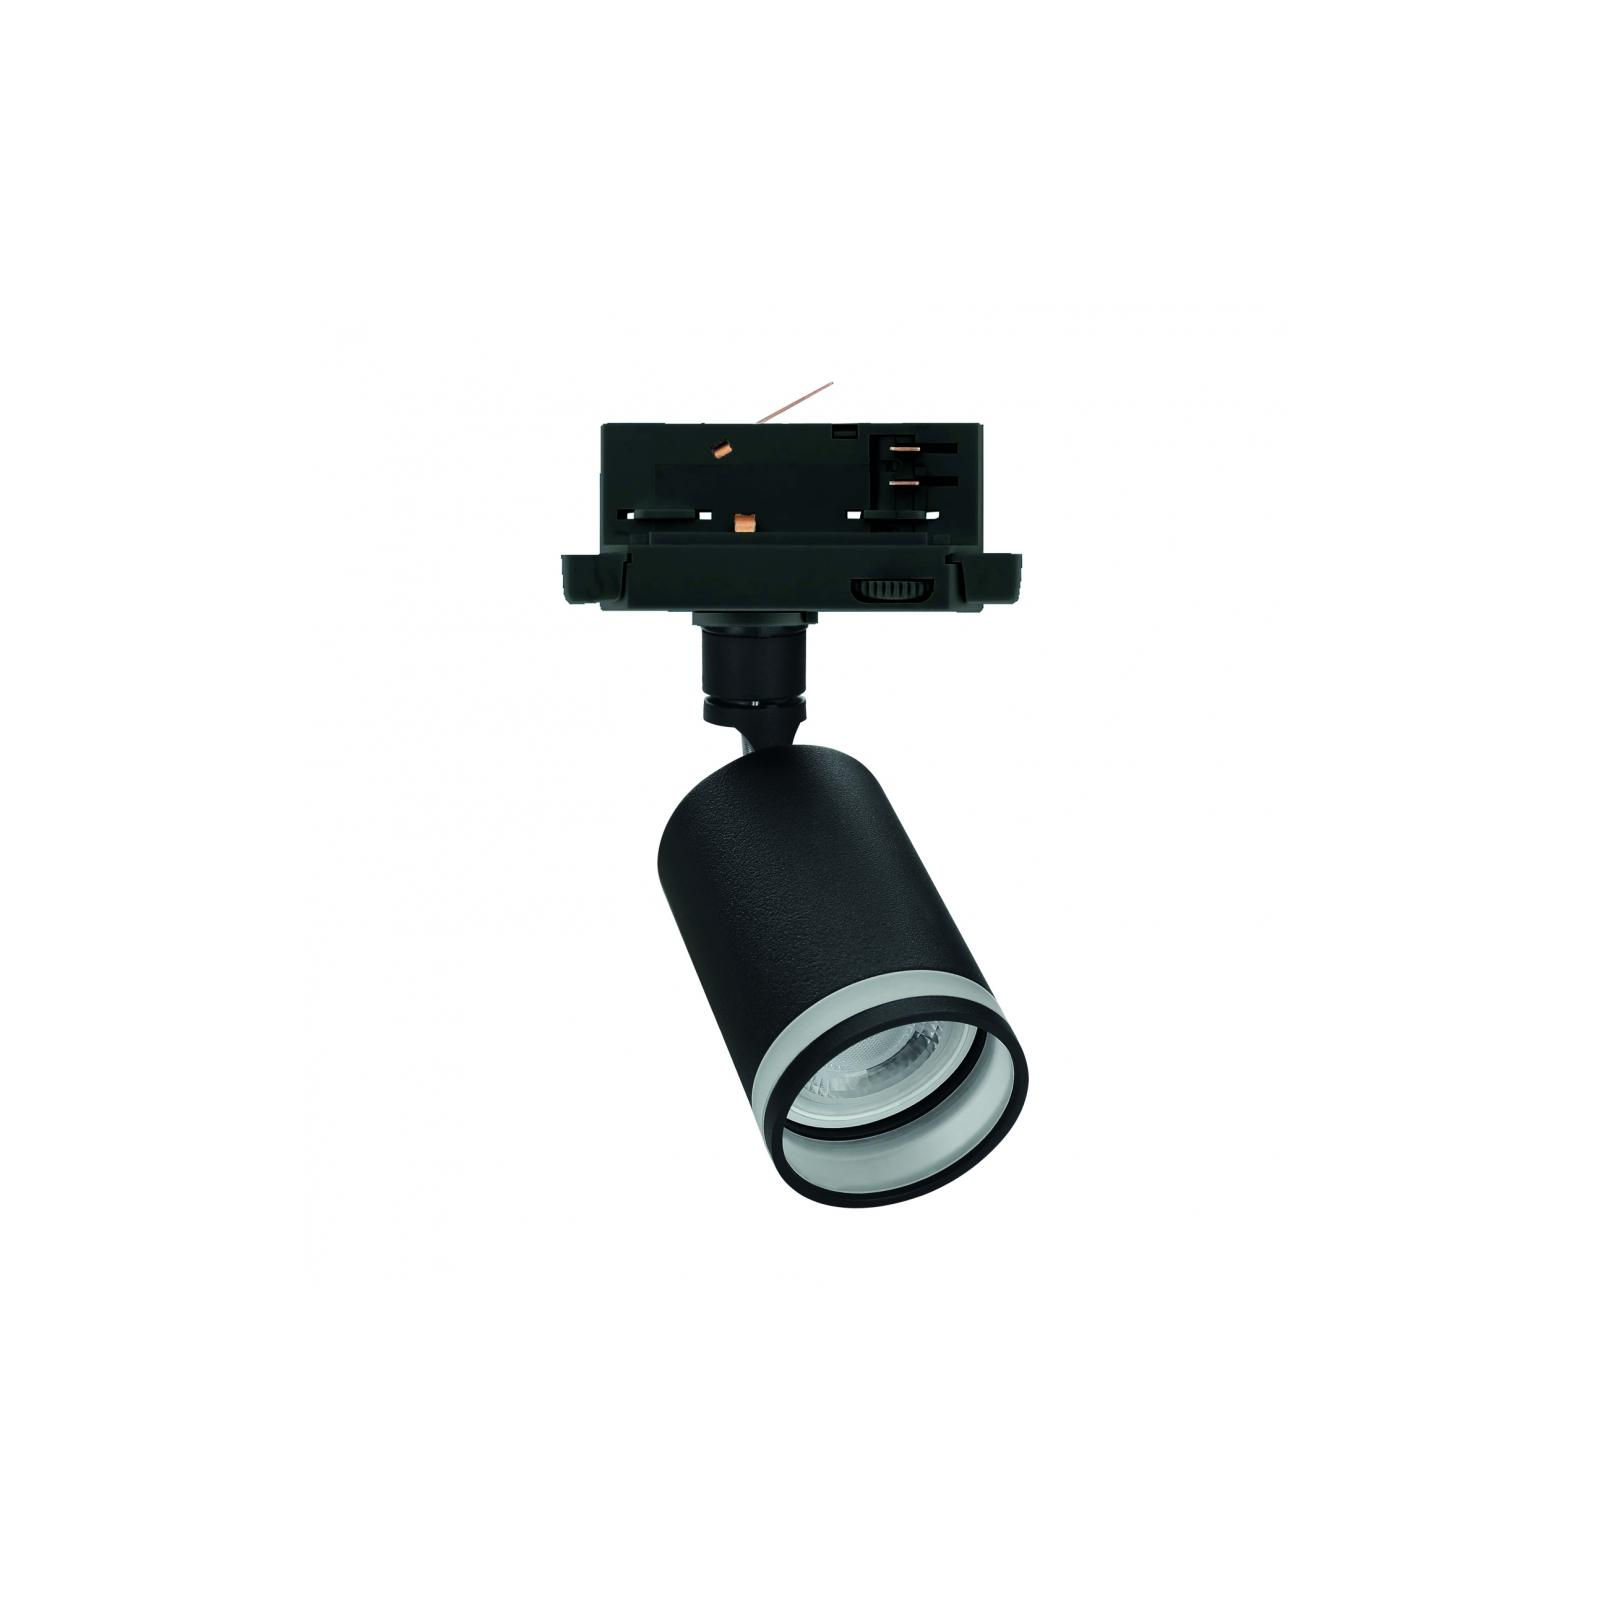 SPECTRUM MADARA MINI RING GU10 3F Černá SLIP003011